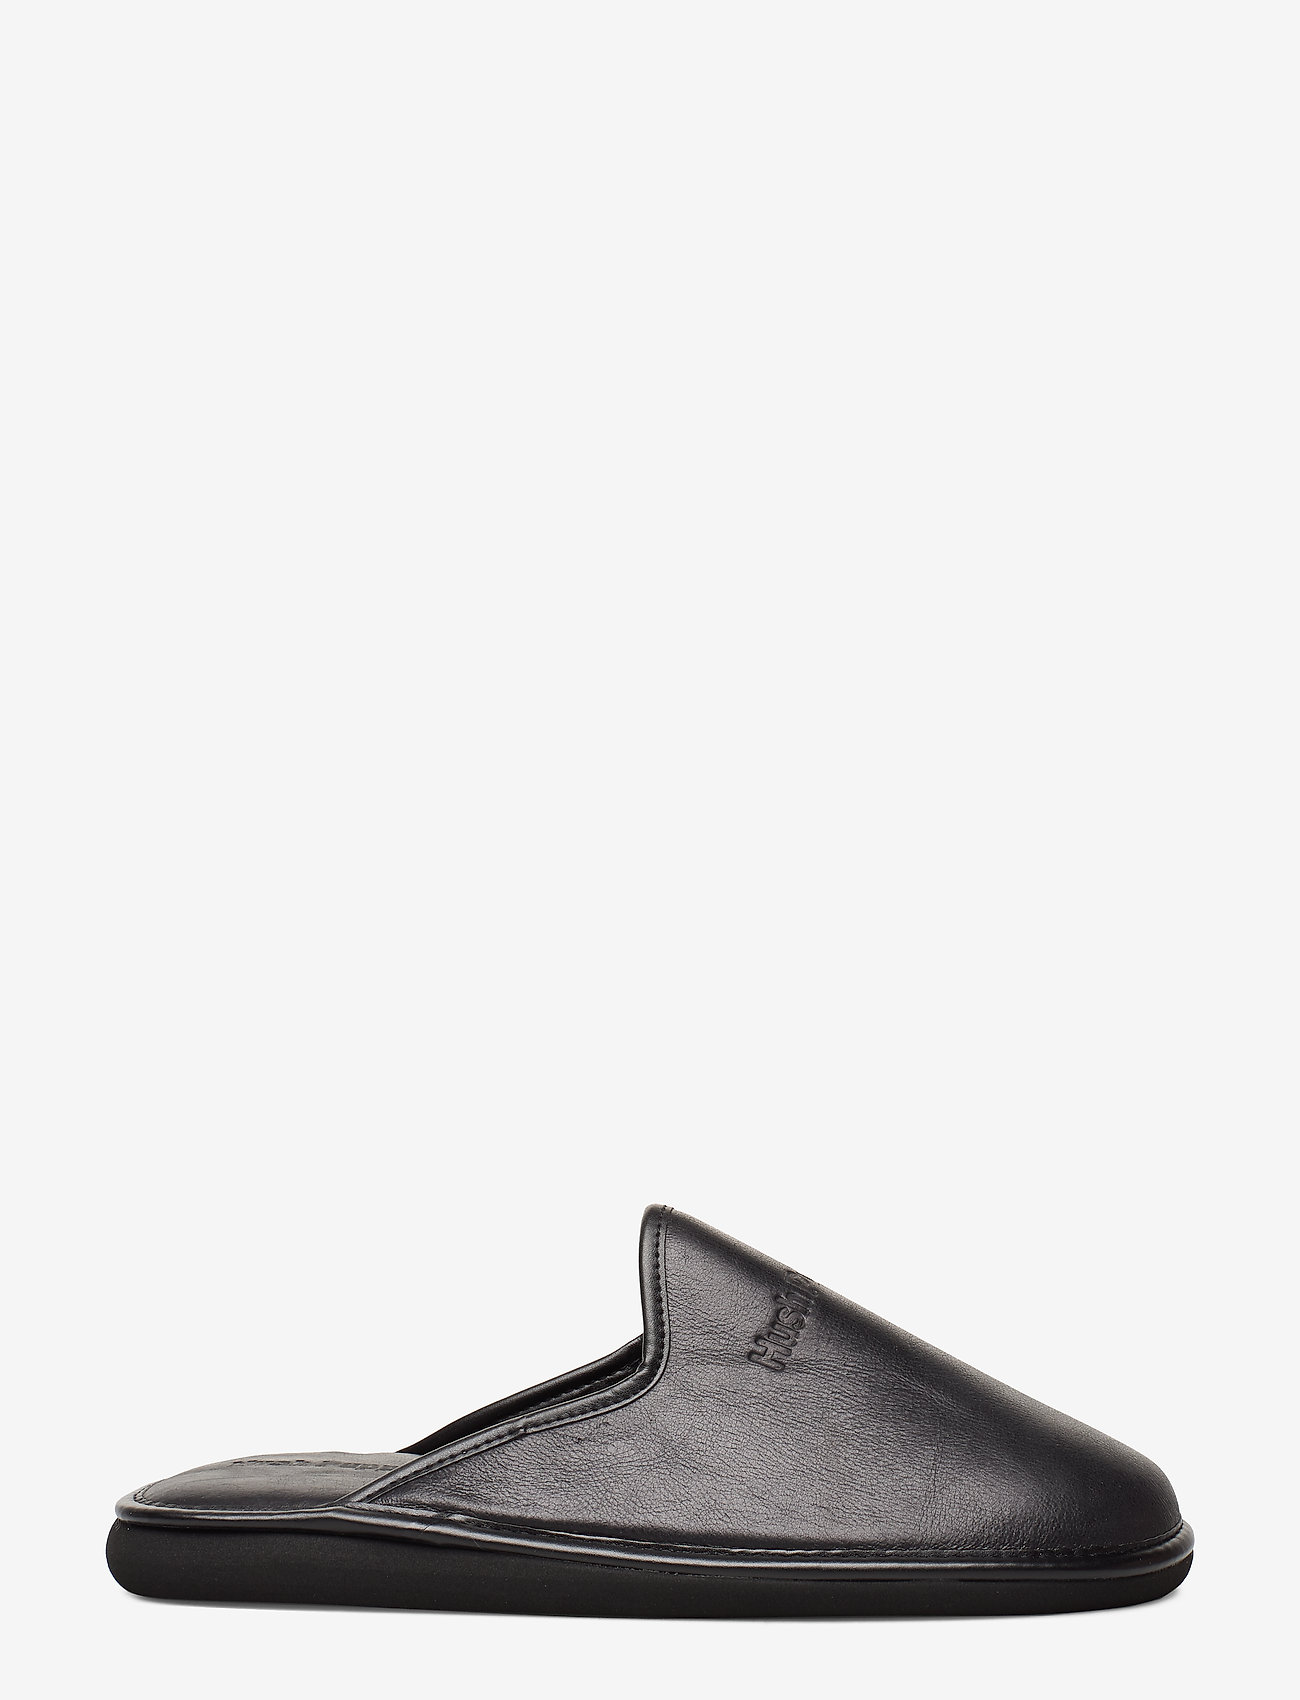 Leather (Black) (48.30 €) - Hush Puppies FXrKx